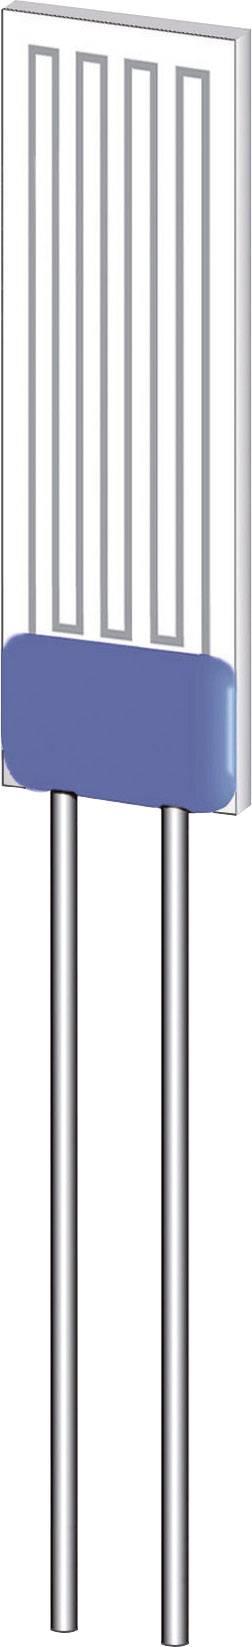 Platinový teplotní senzor Heraeus M1020, -70 - +500°C, Pt 100, bez pouzdra